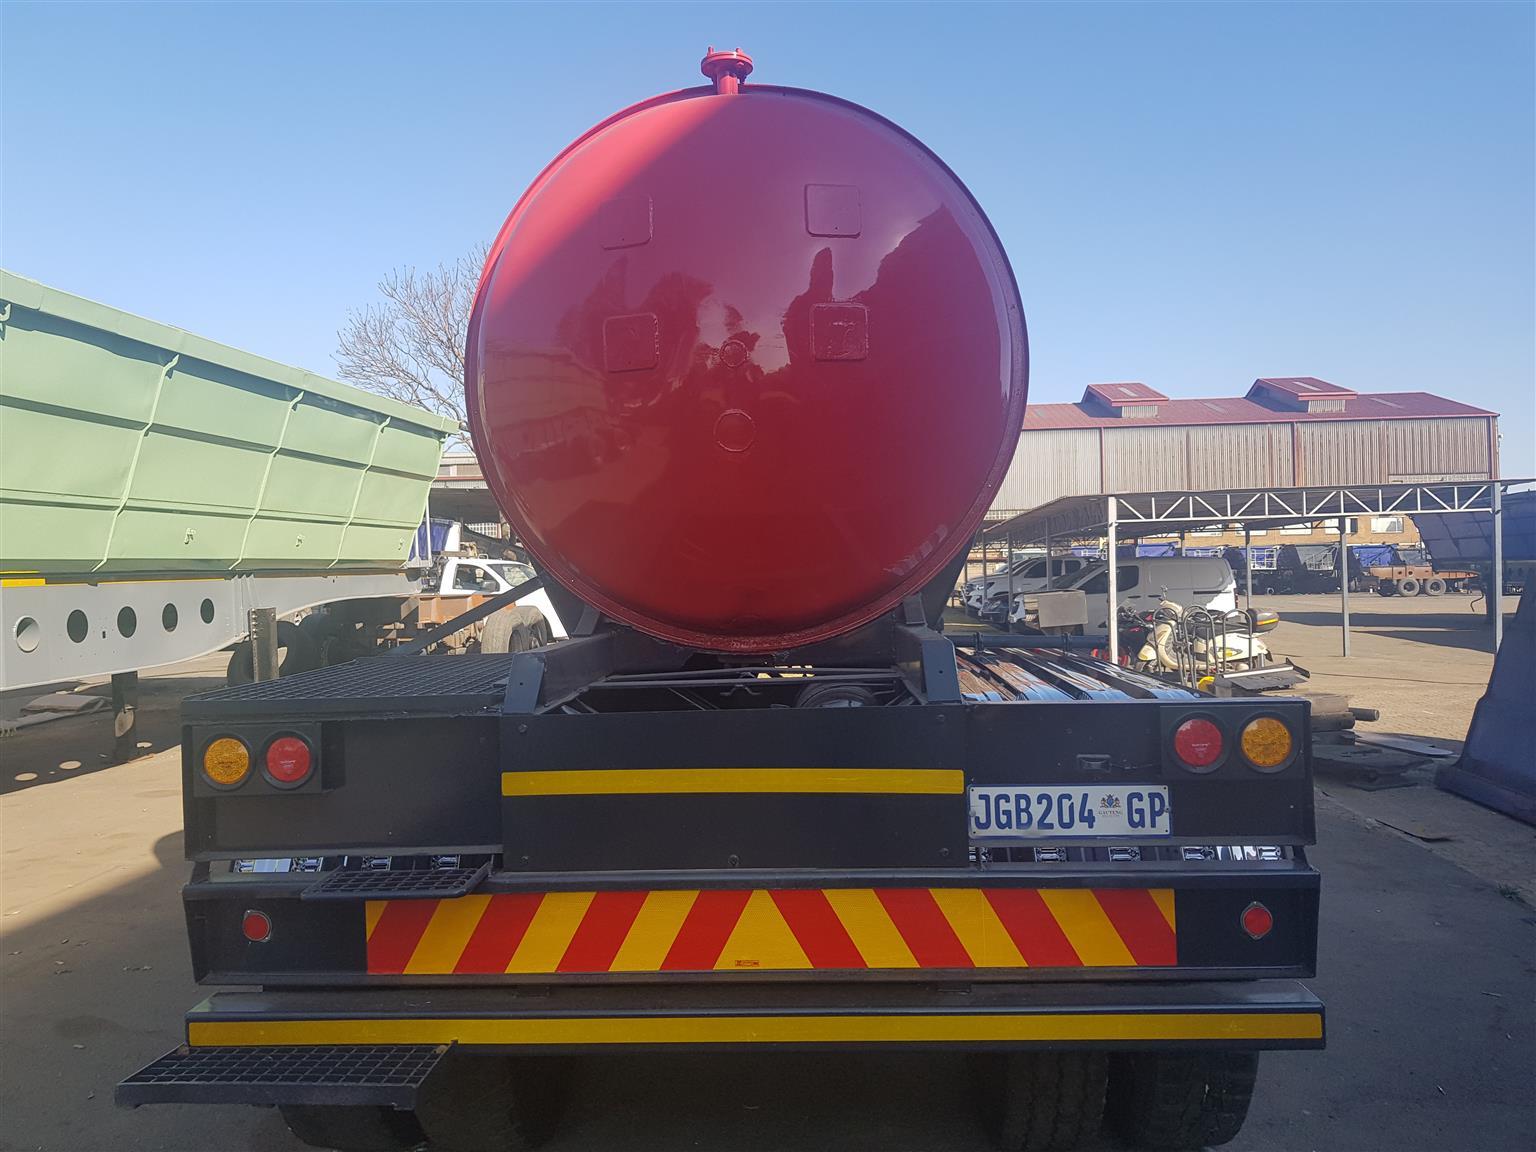 304 stainless steel tanker